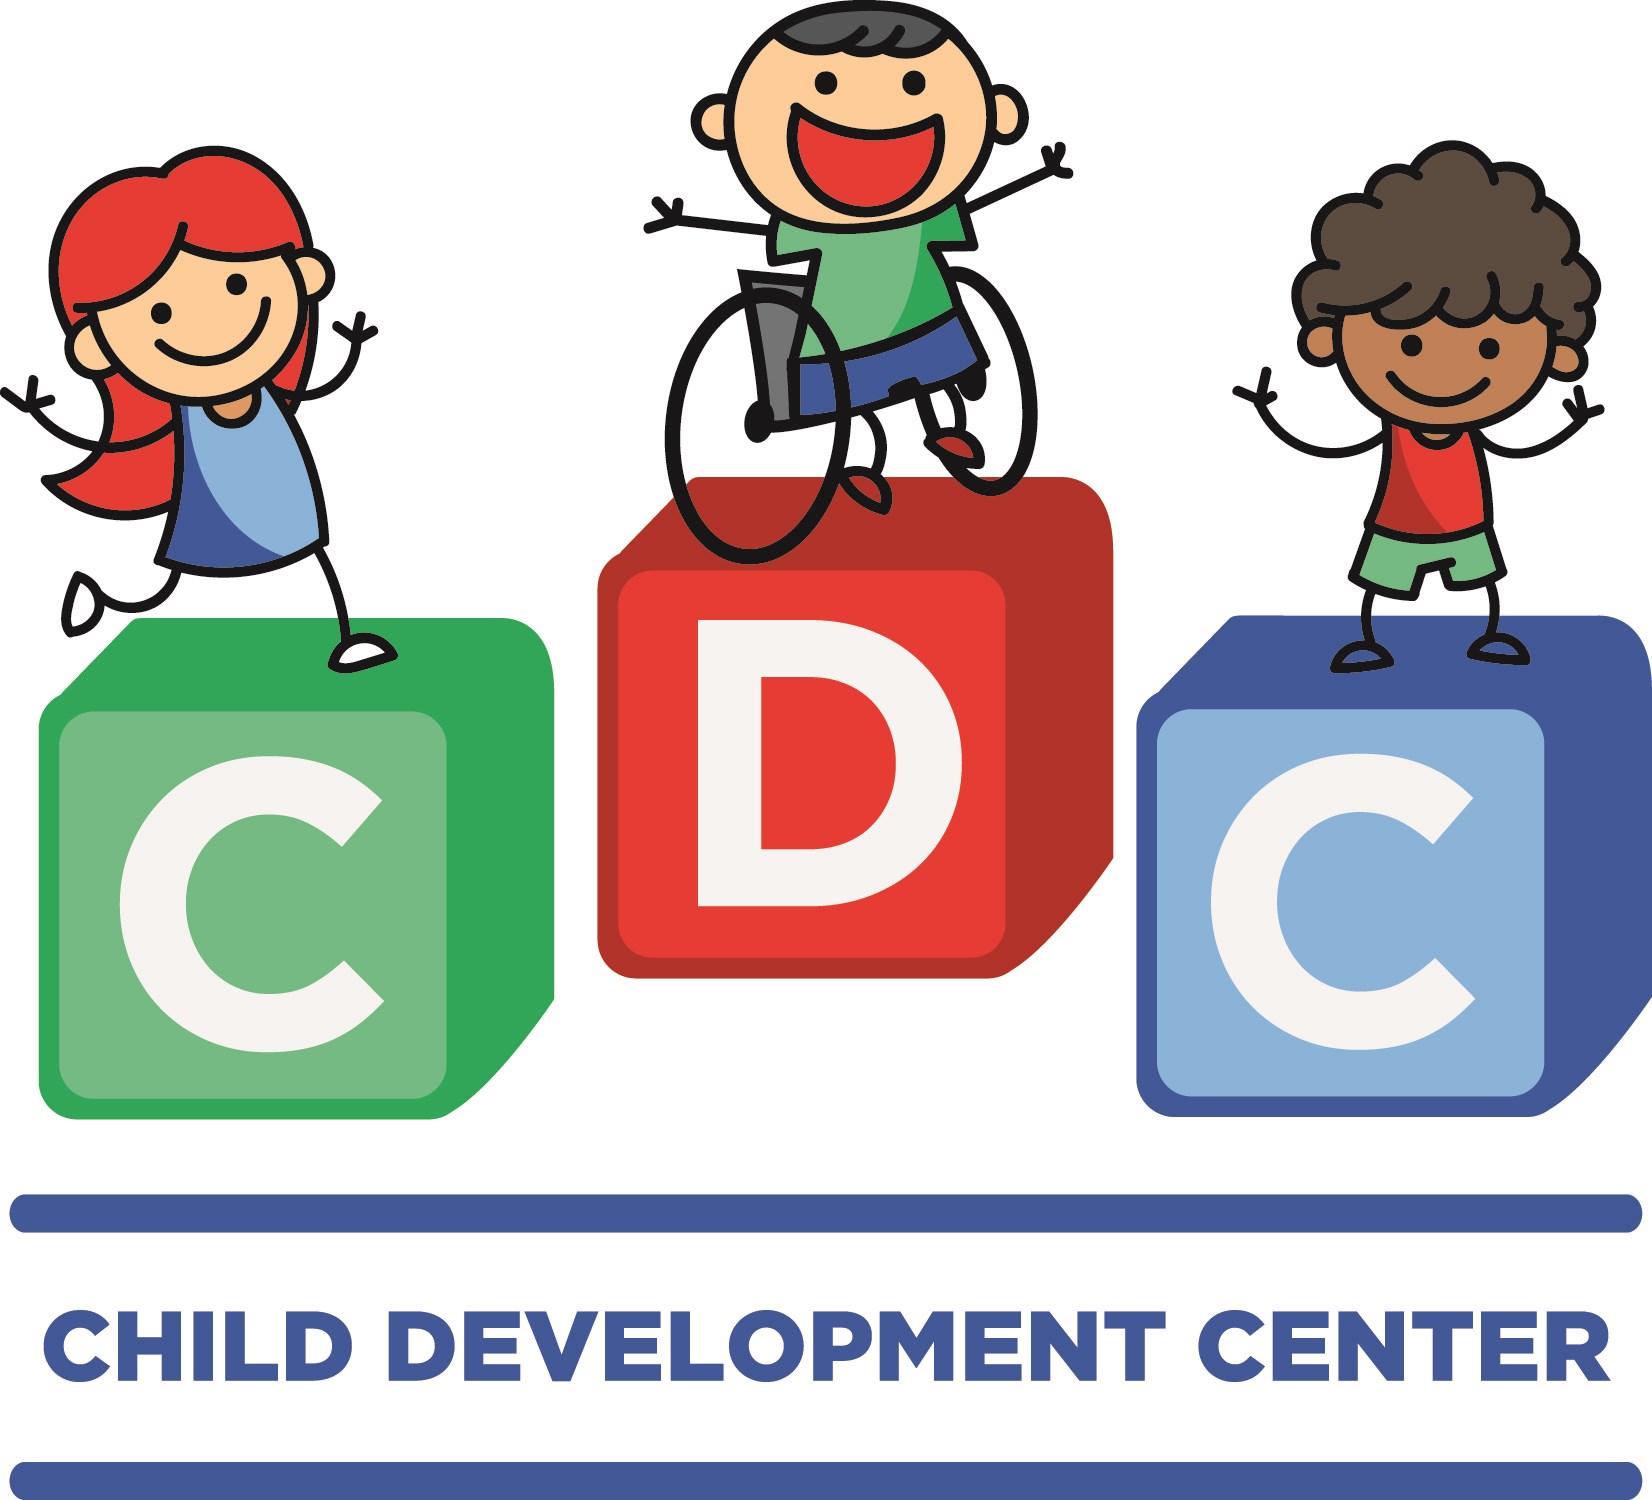 paws4people Sponsor | CDC